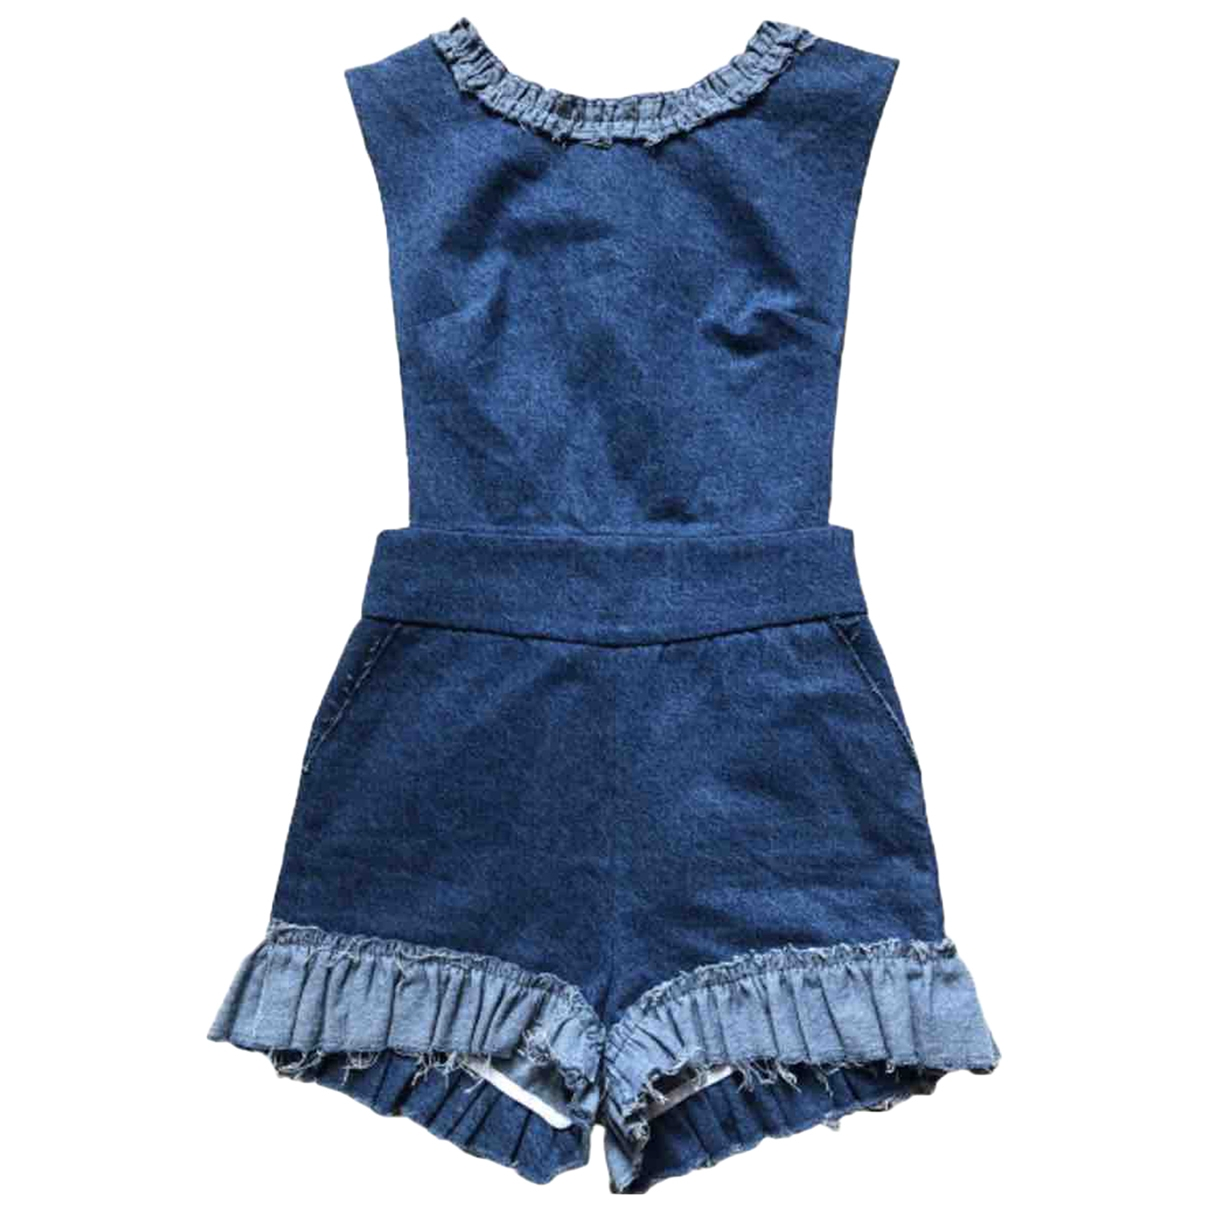 Côme \N Blue Denim - Jeans jumpsuit for Women 34 FR